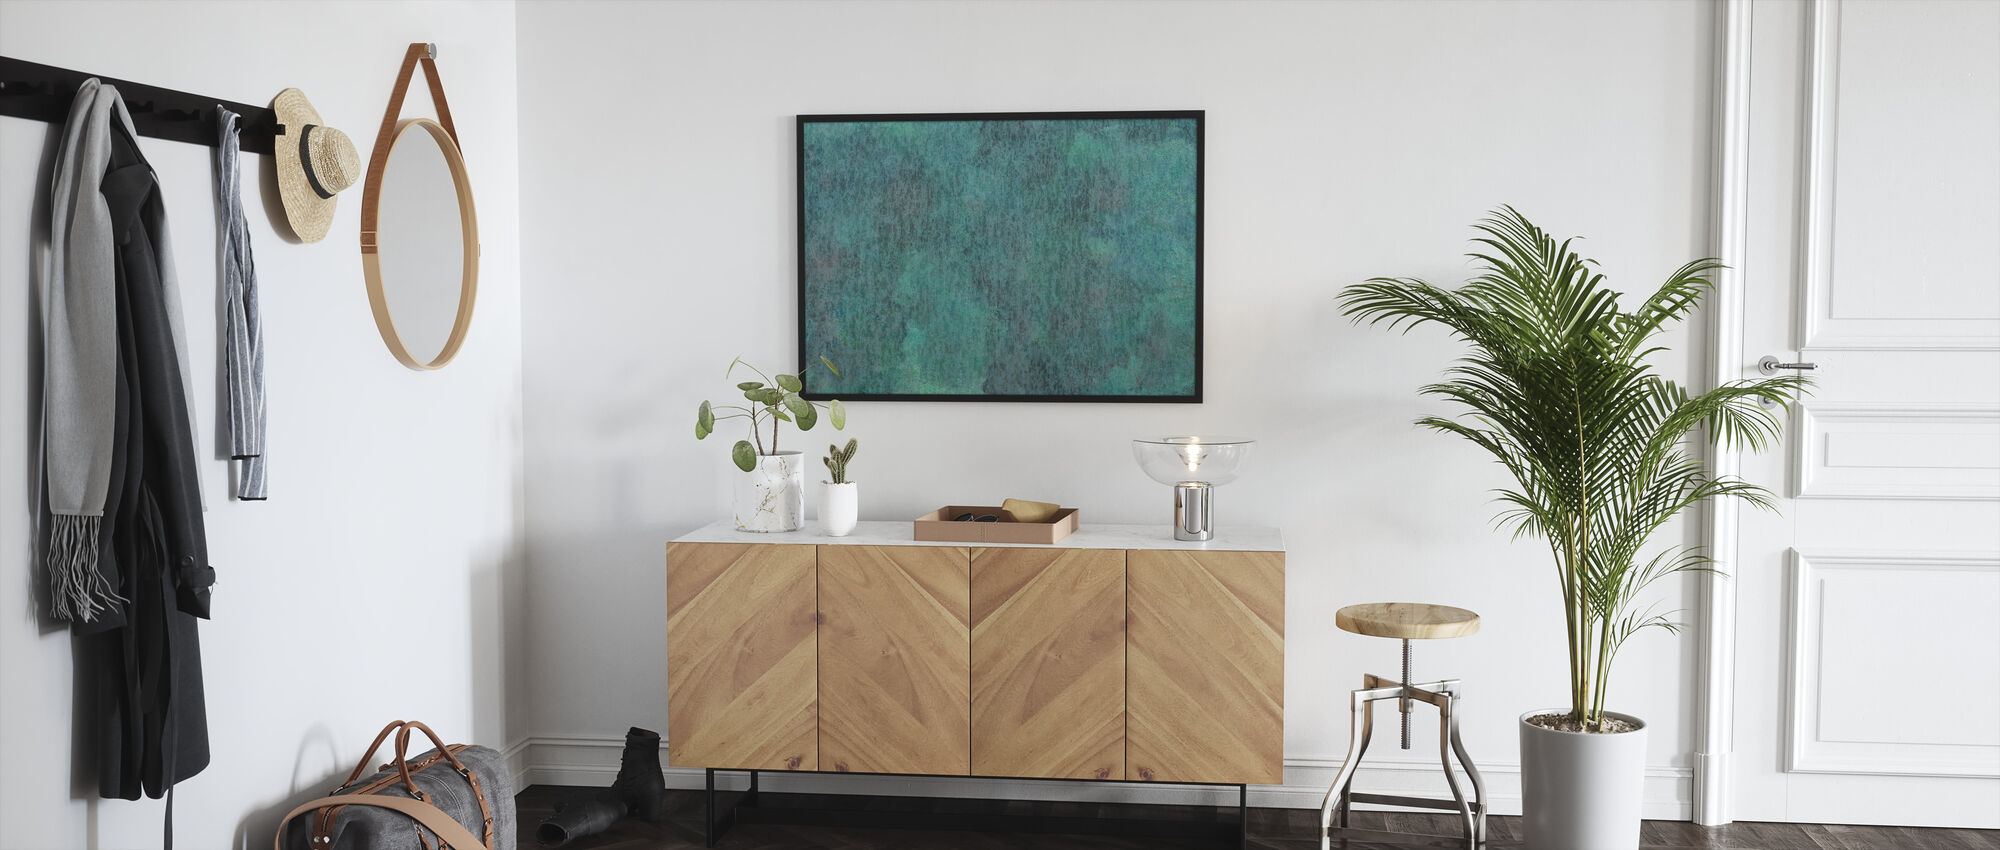 Copper Oxidation on Metal - Framed print - Hallway